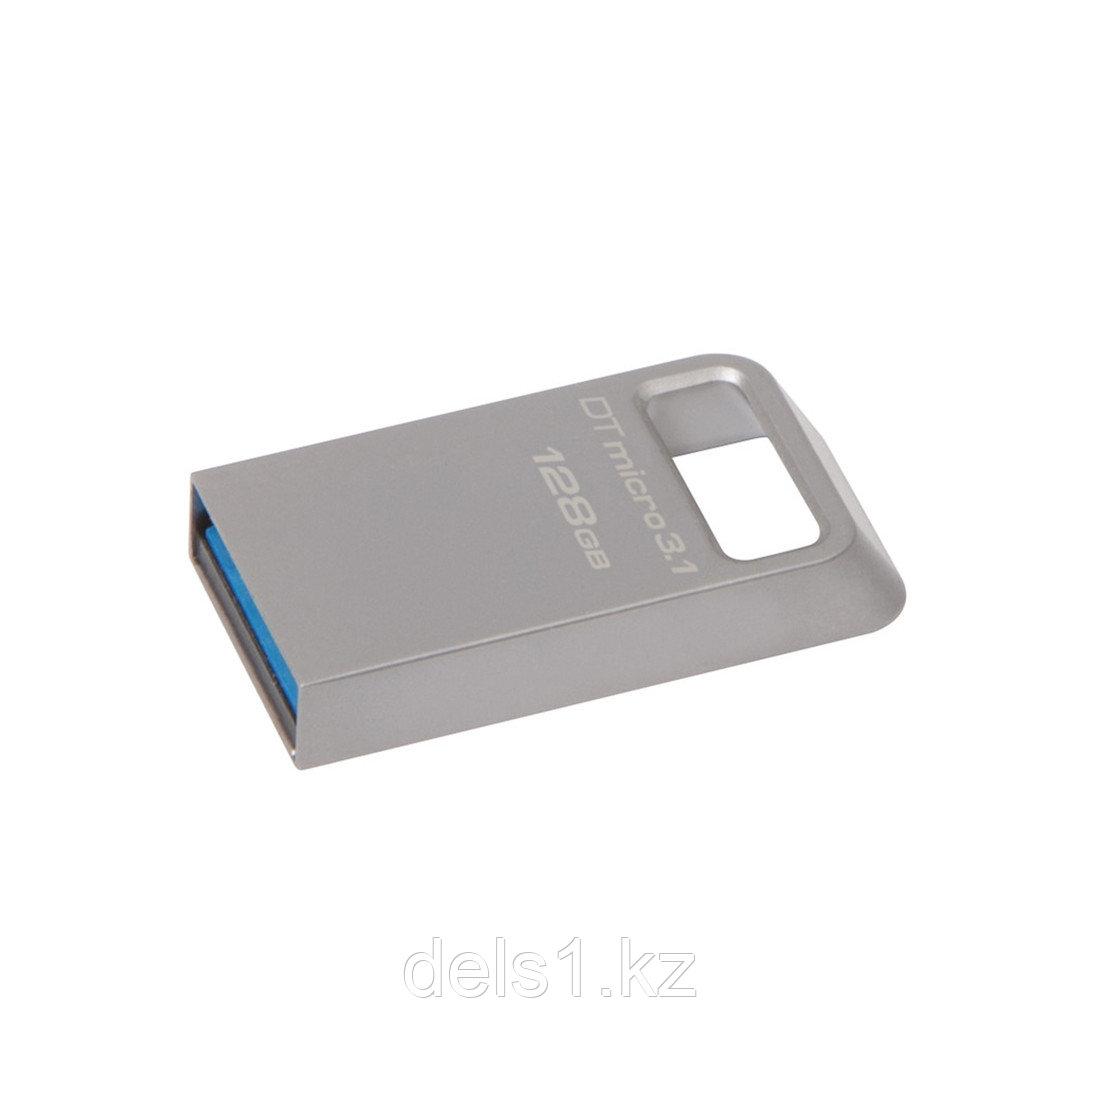 USB-накопитель Kingston DataTraveler® MC3 (DTMC3) 128GB